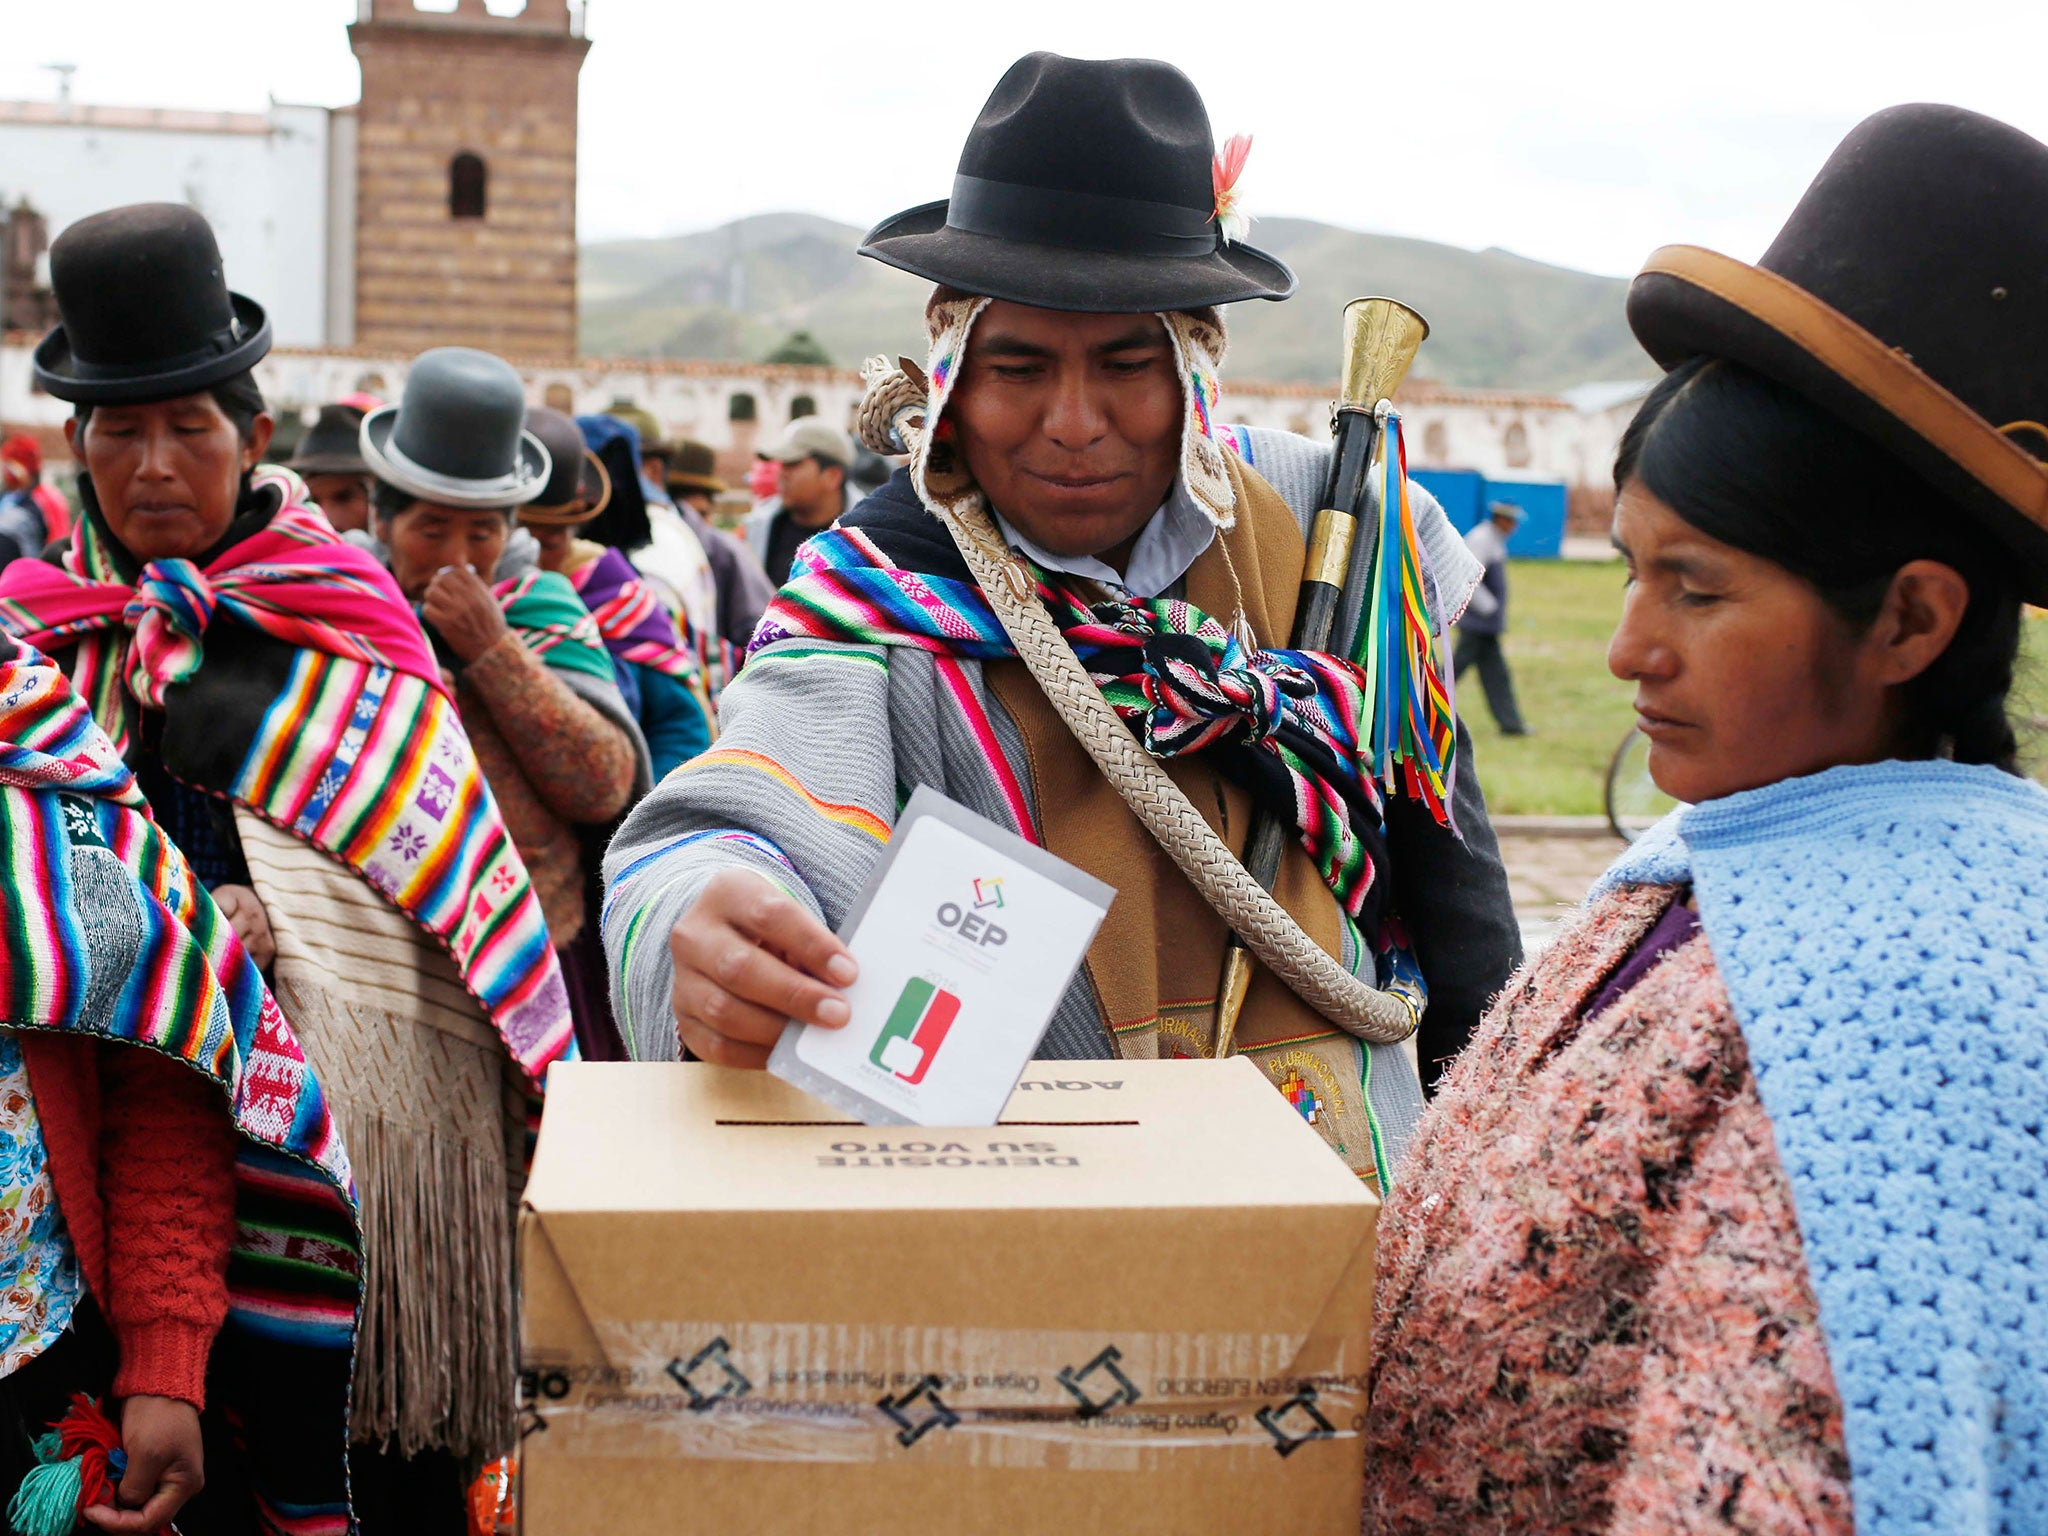 Bolivian dating culture